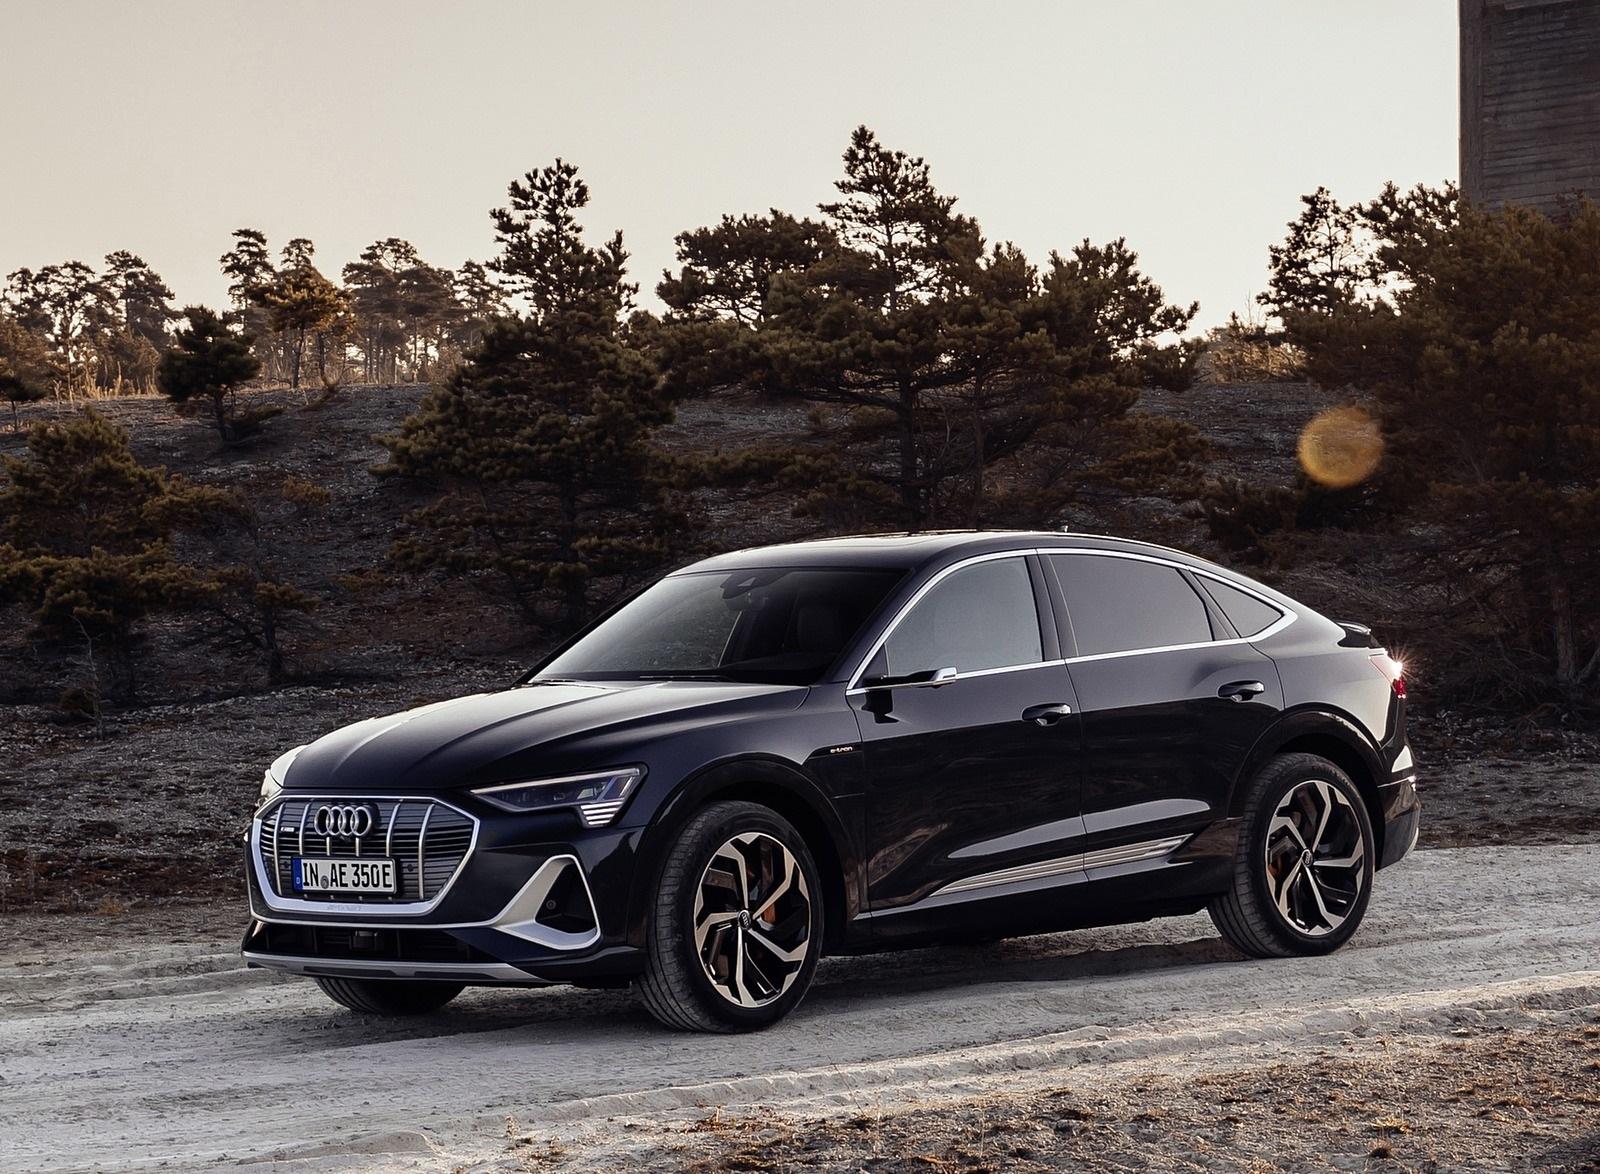 2020 Audi e-tron Sportback (Color: Plasma Blue) Front Three-Quarter Wallpapers (1)